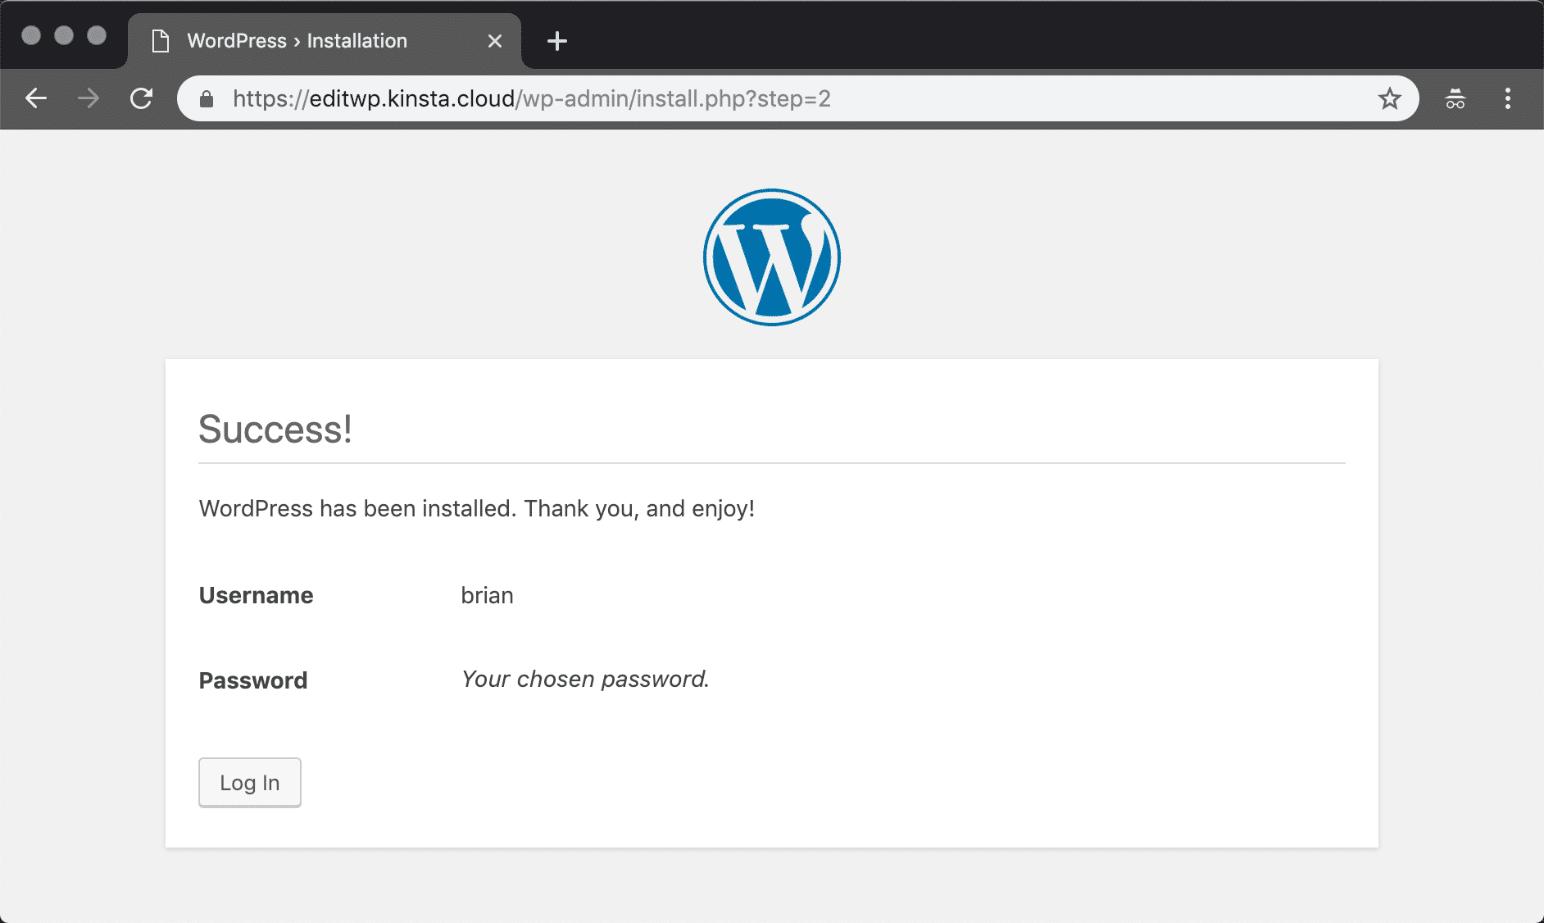 Instalando manualmente WordPress con éxito